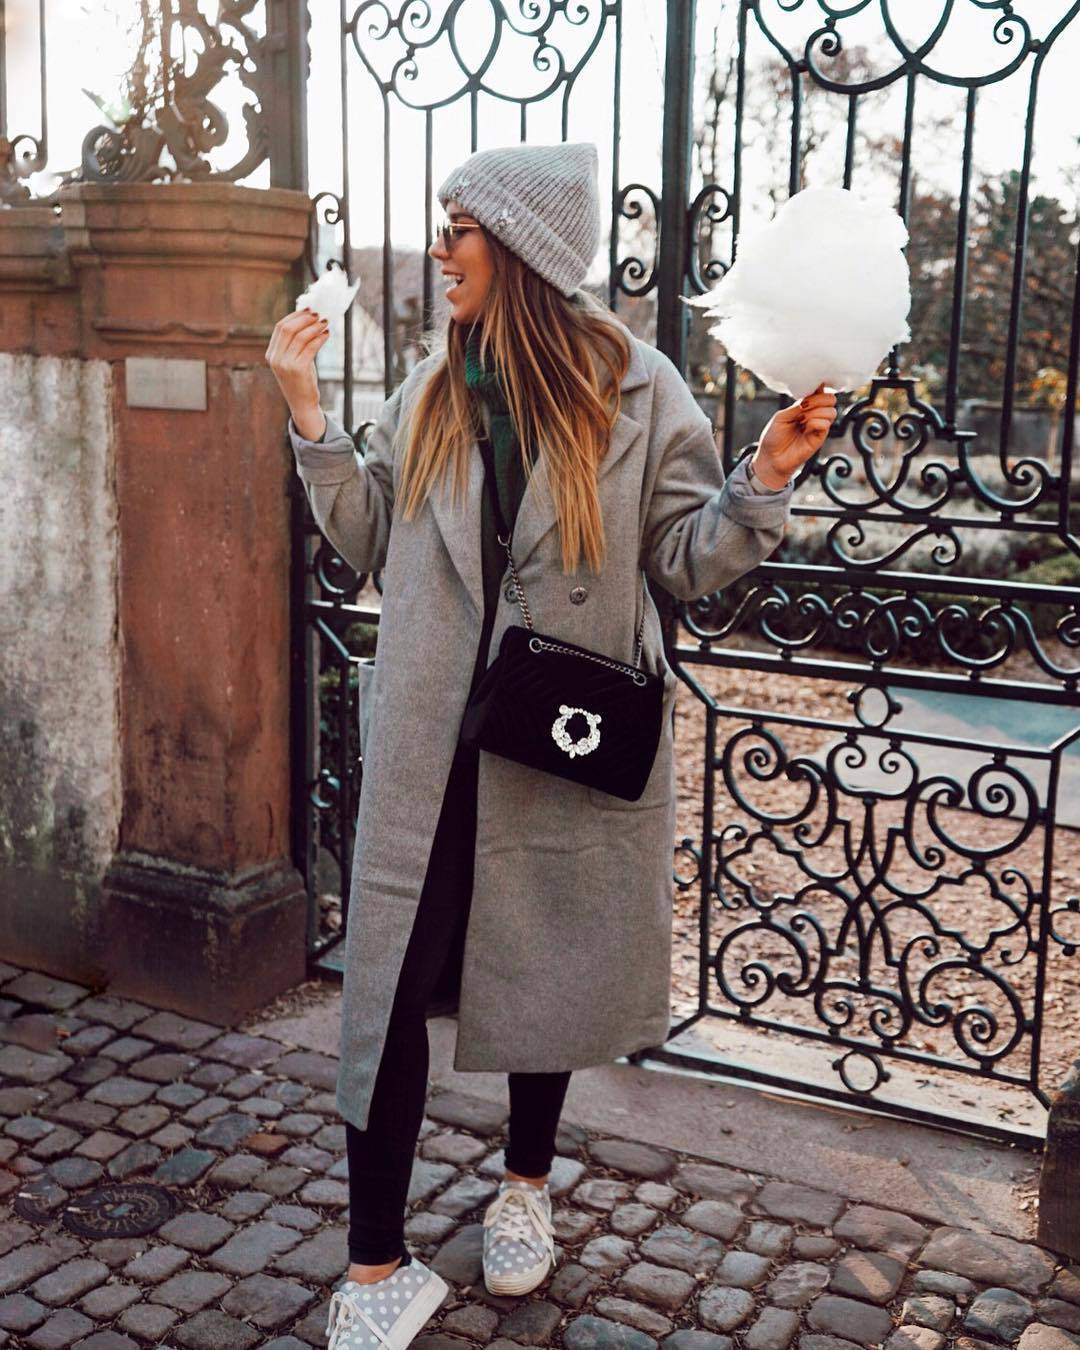 bag crossbody bag velvet sneakers black leggings grey coat long coat turtleneck sweater knitted sweater grey beanie